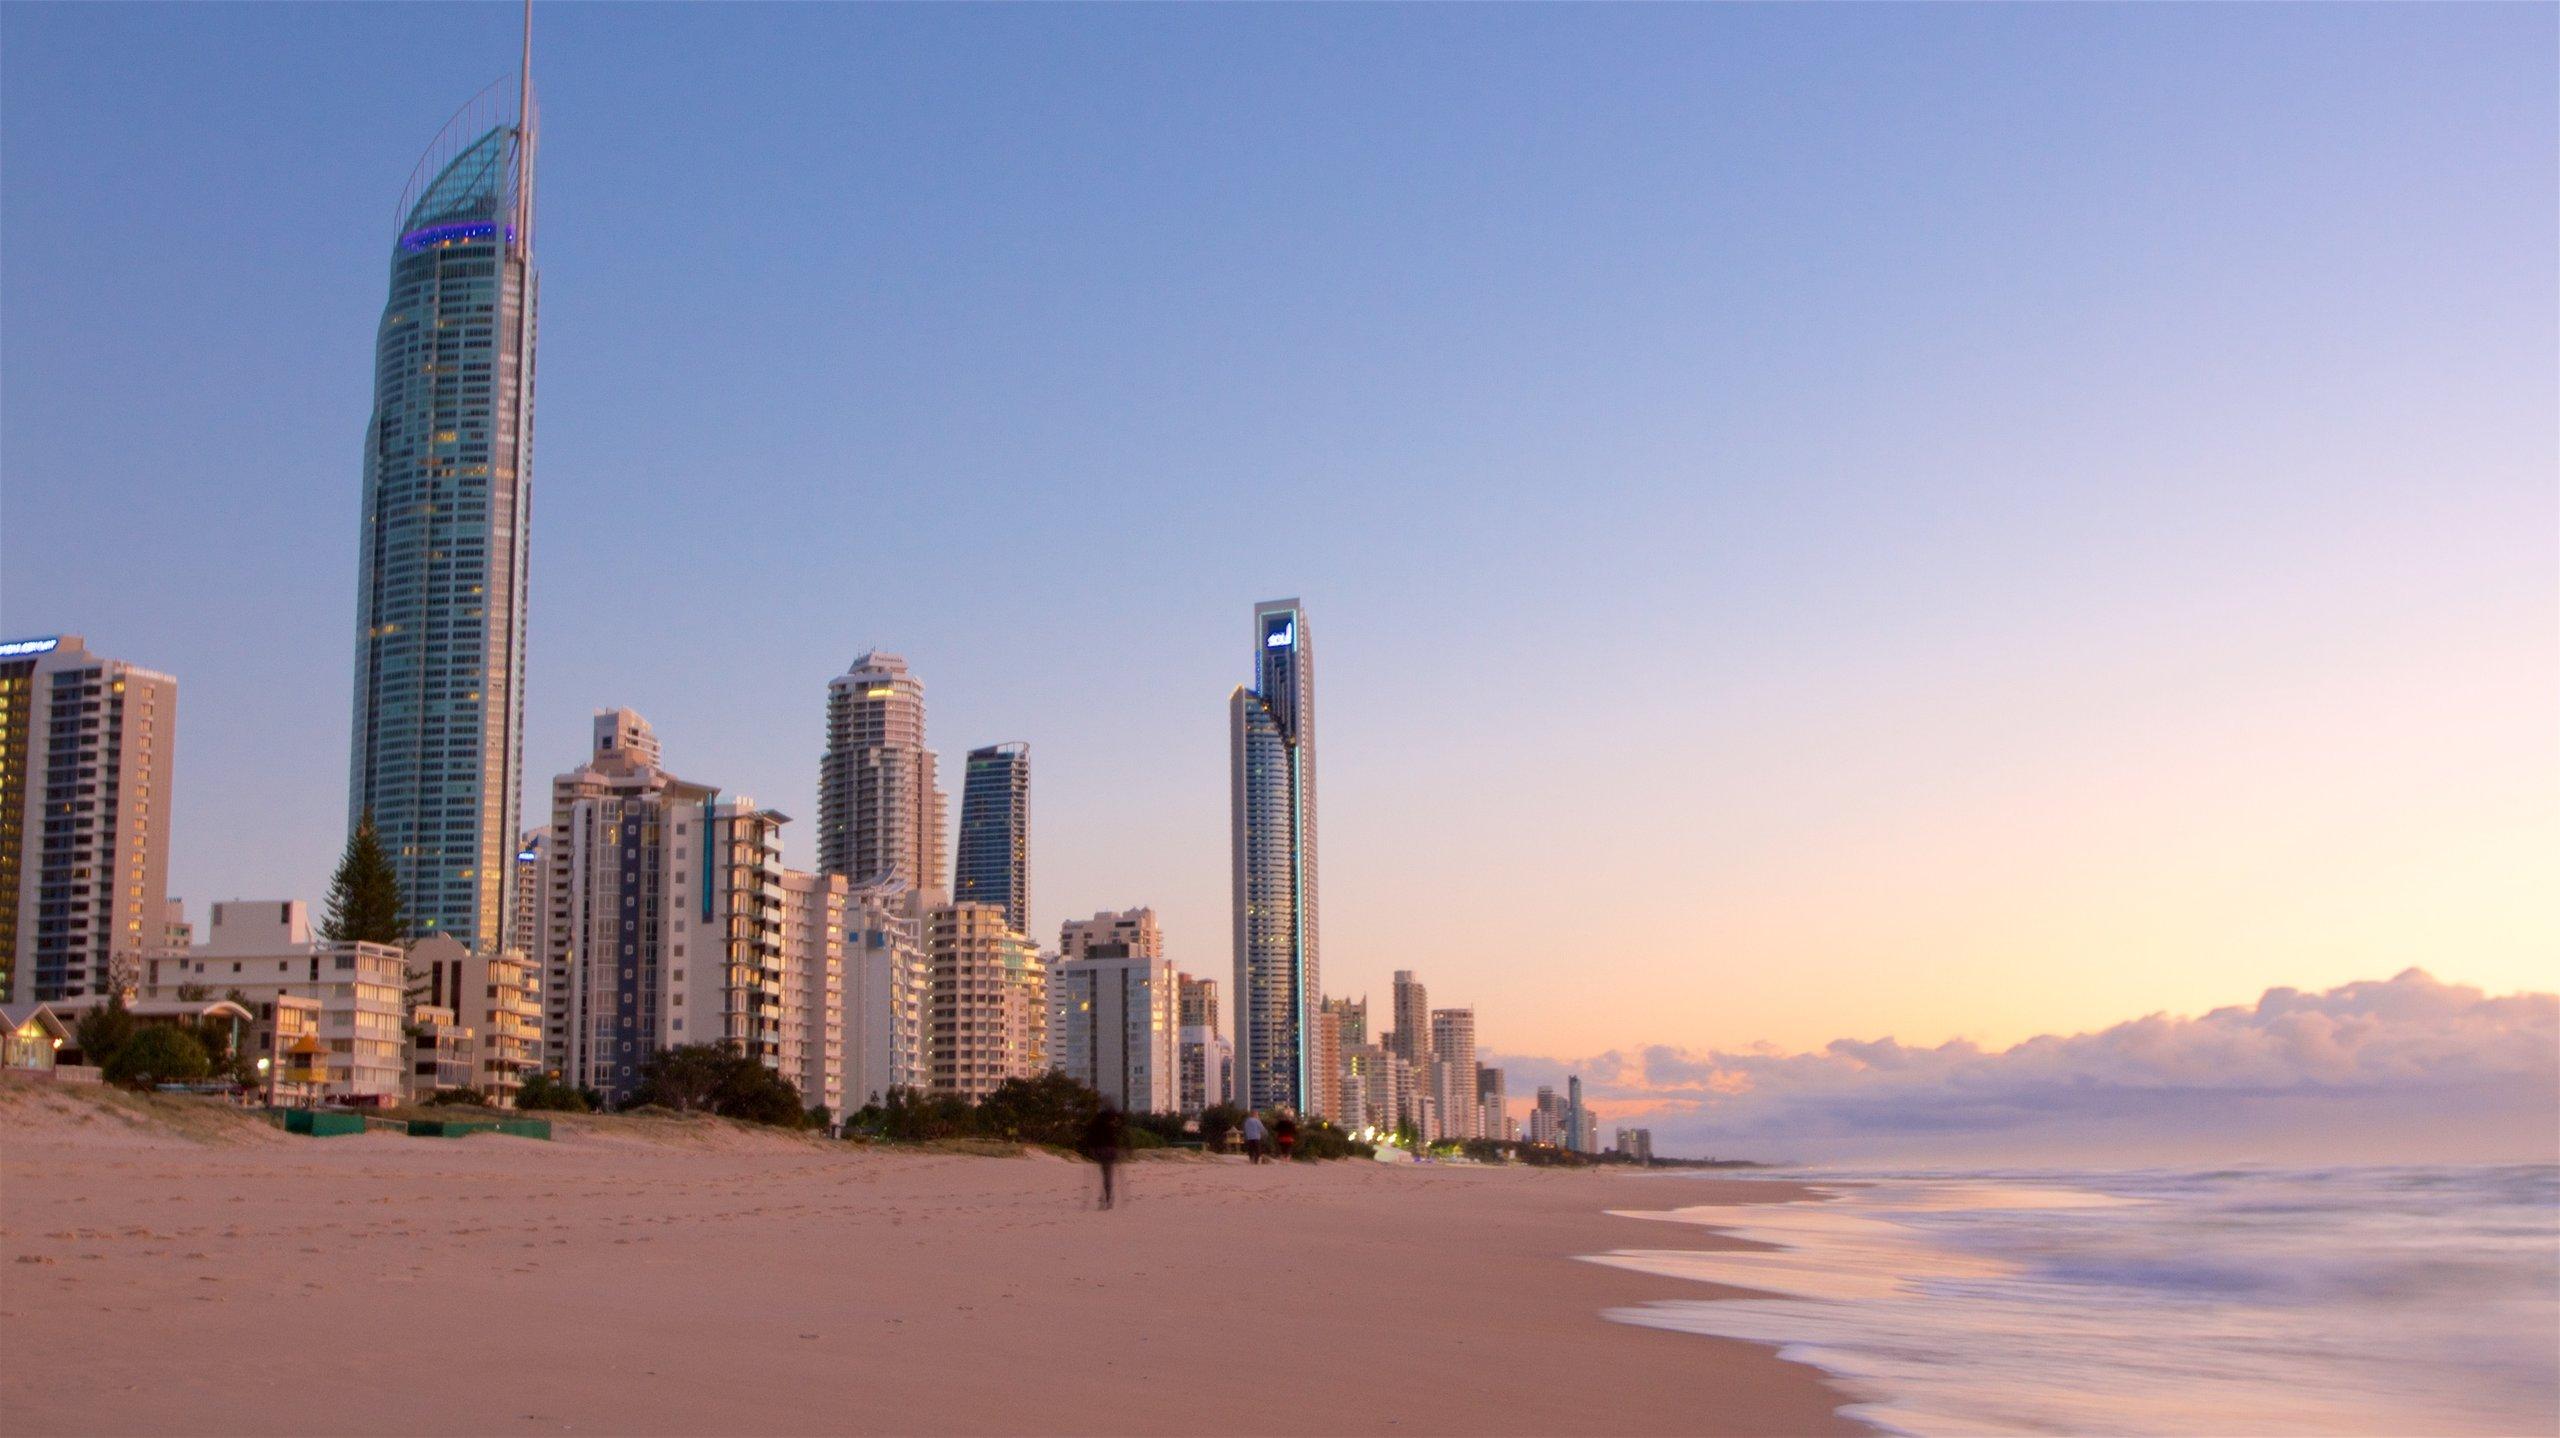 Mermaid Beach, Gold Coast, Queensland, Australia